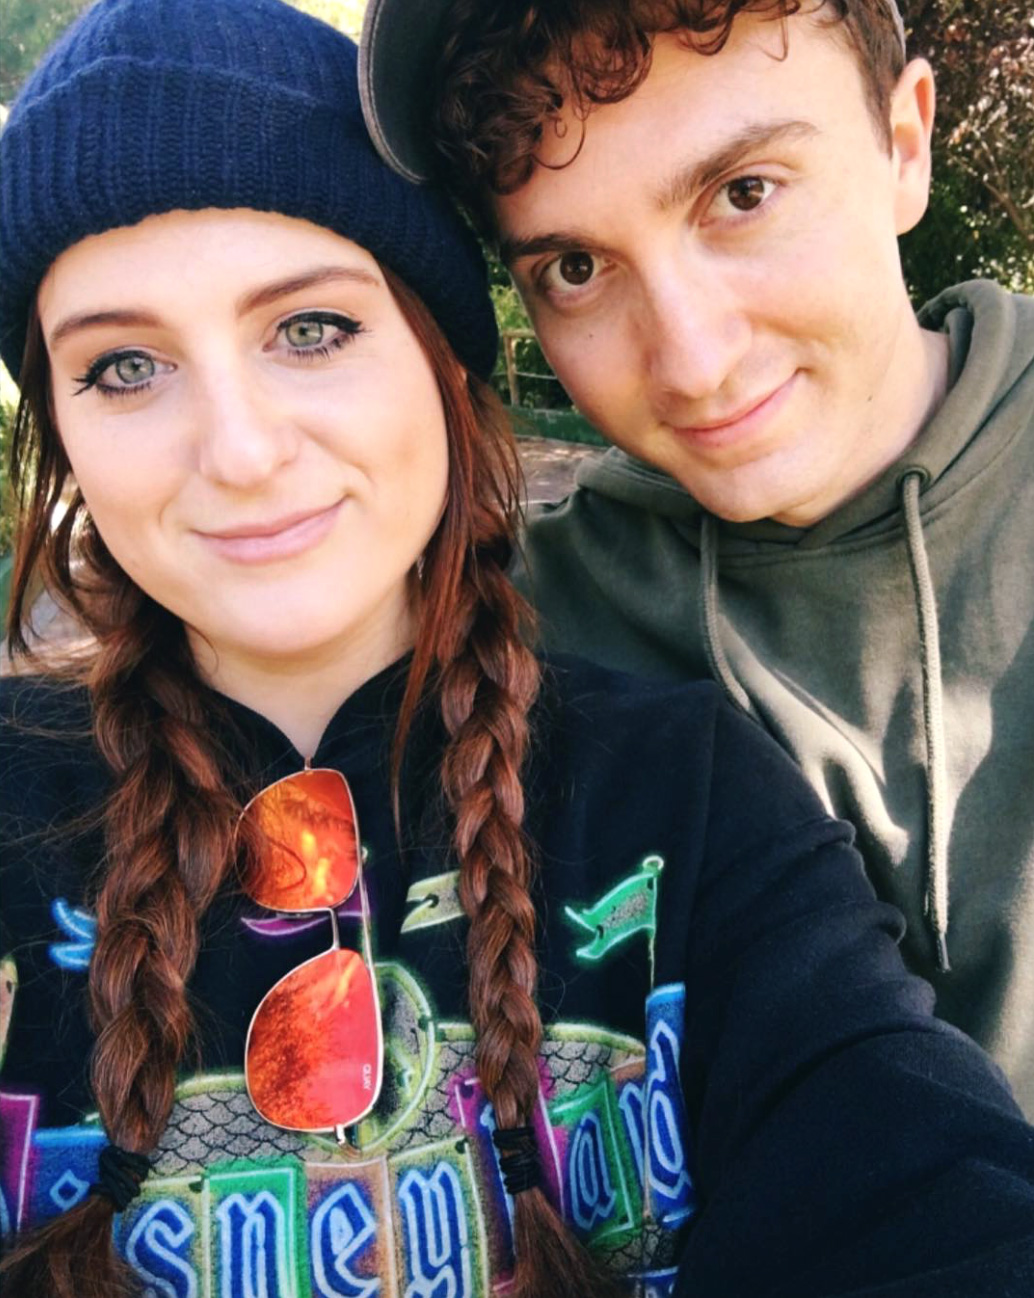 https://www.instagram.com/p/BLi1G71Bqnc/ Screengrab of Meghan Trainor's Instagram post of her and her new boyfriend 10/14/16 Source: Meghan Trainor/Instagram